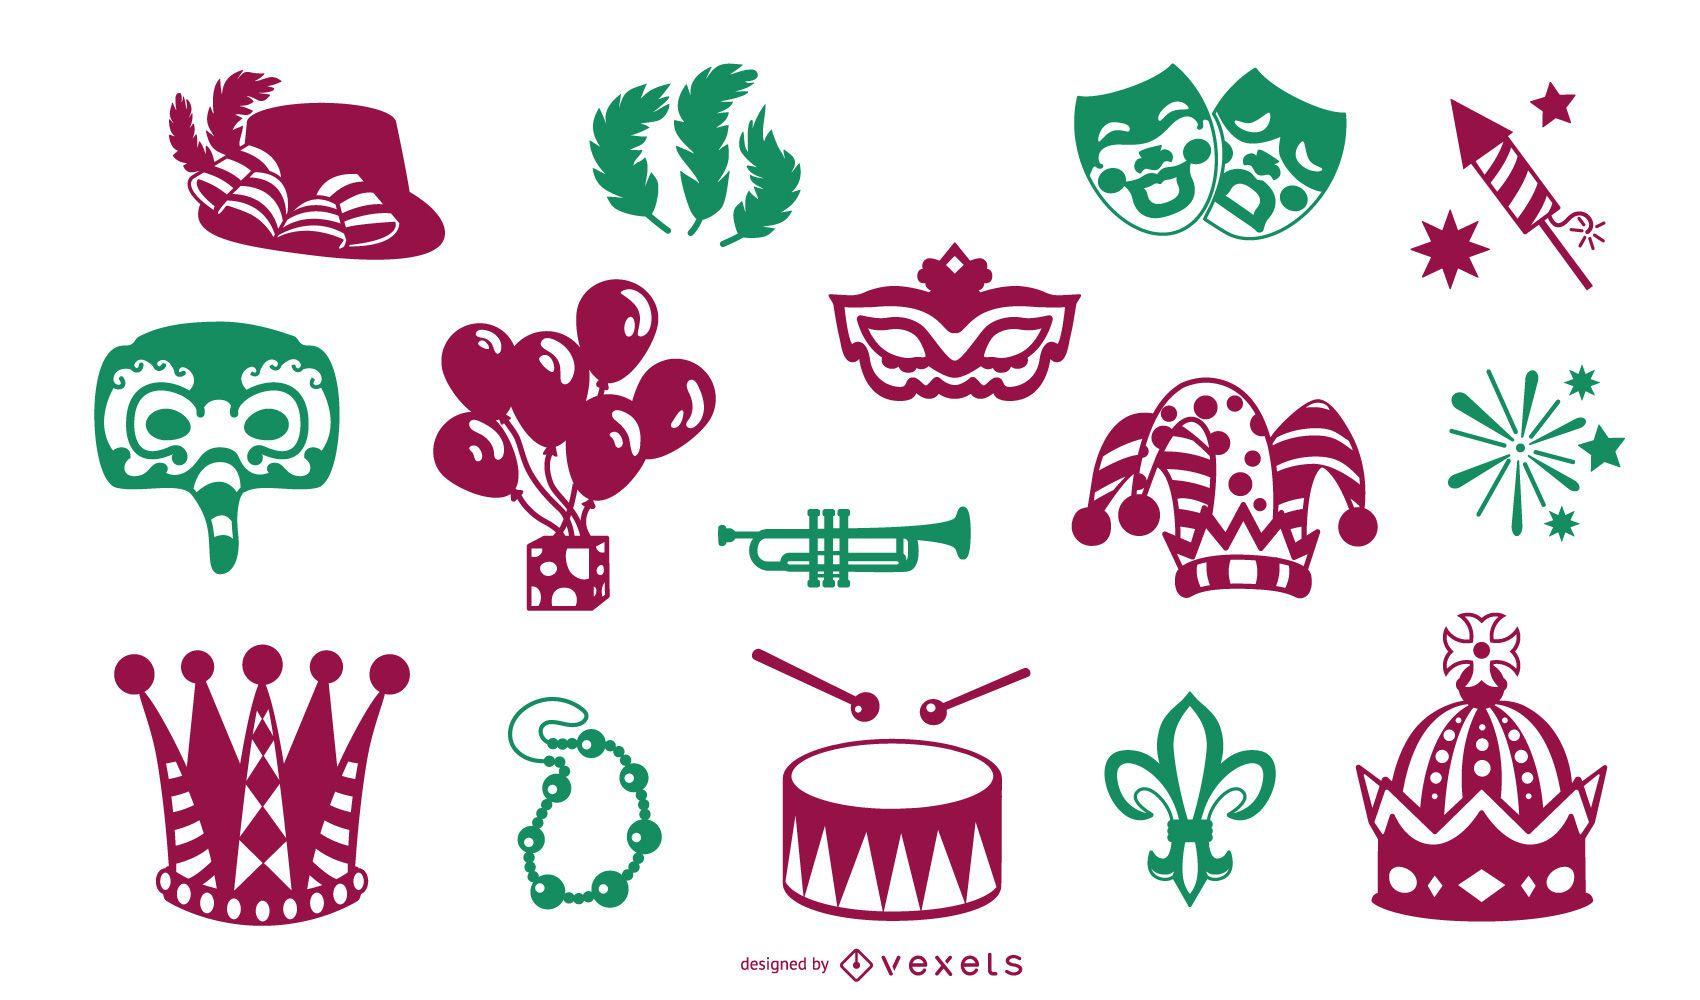 Mardi gras elements collection